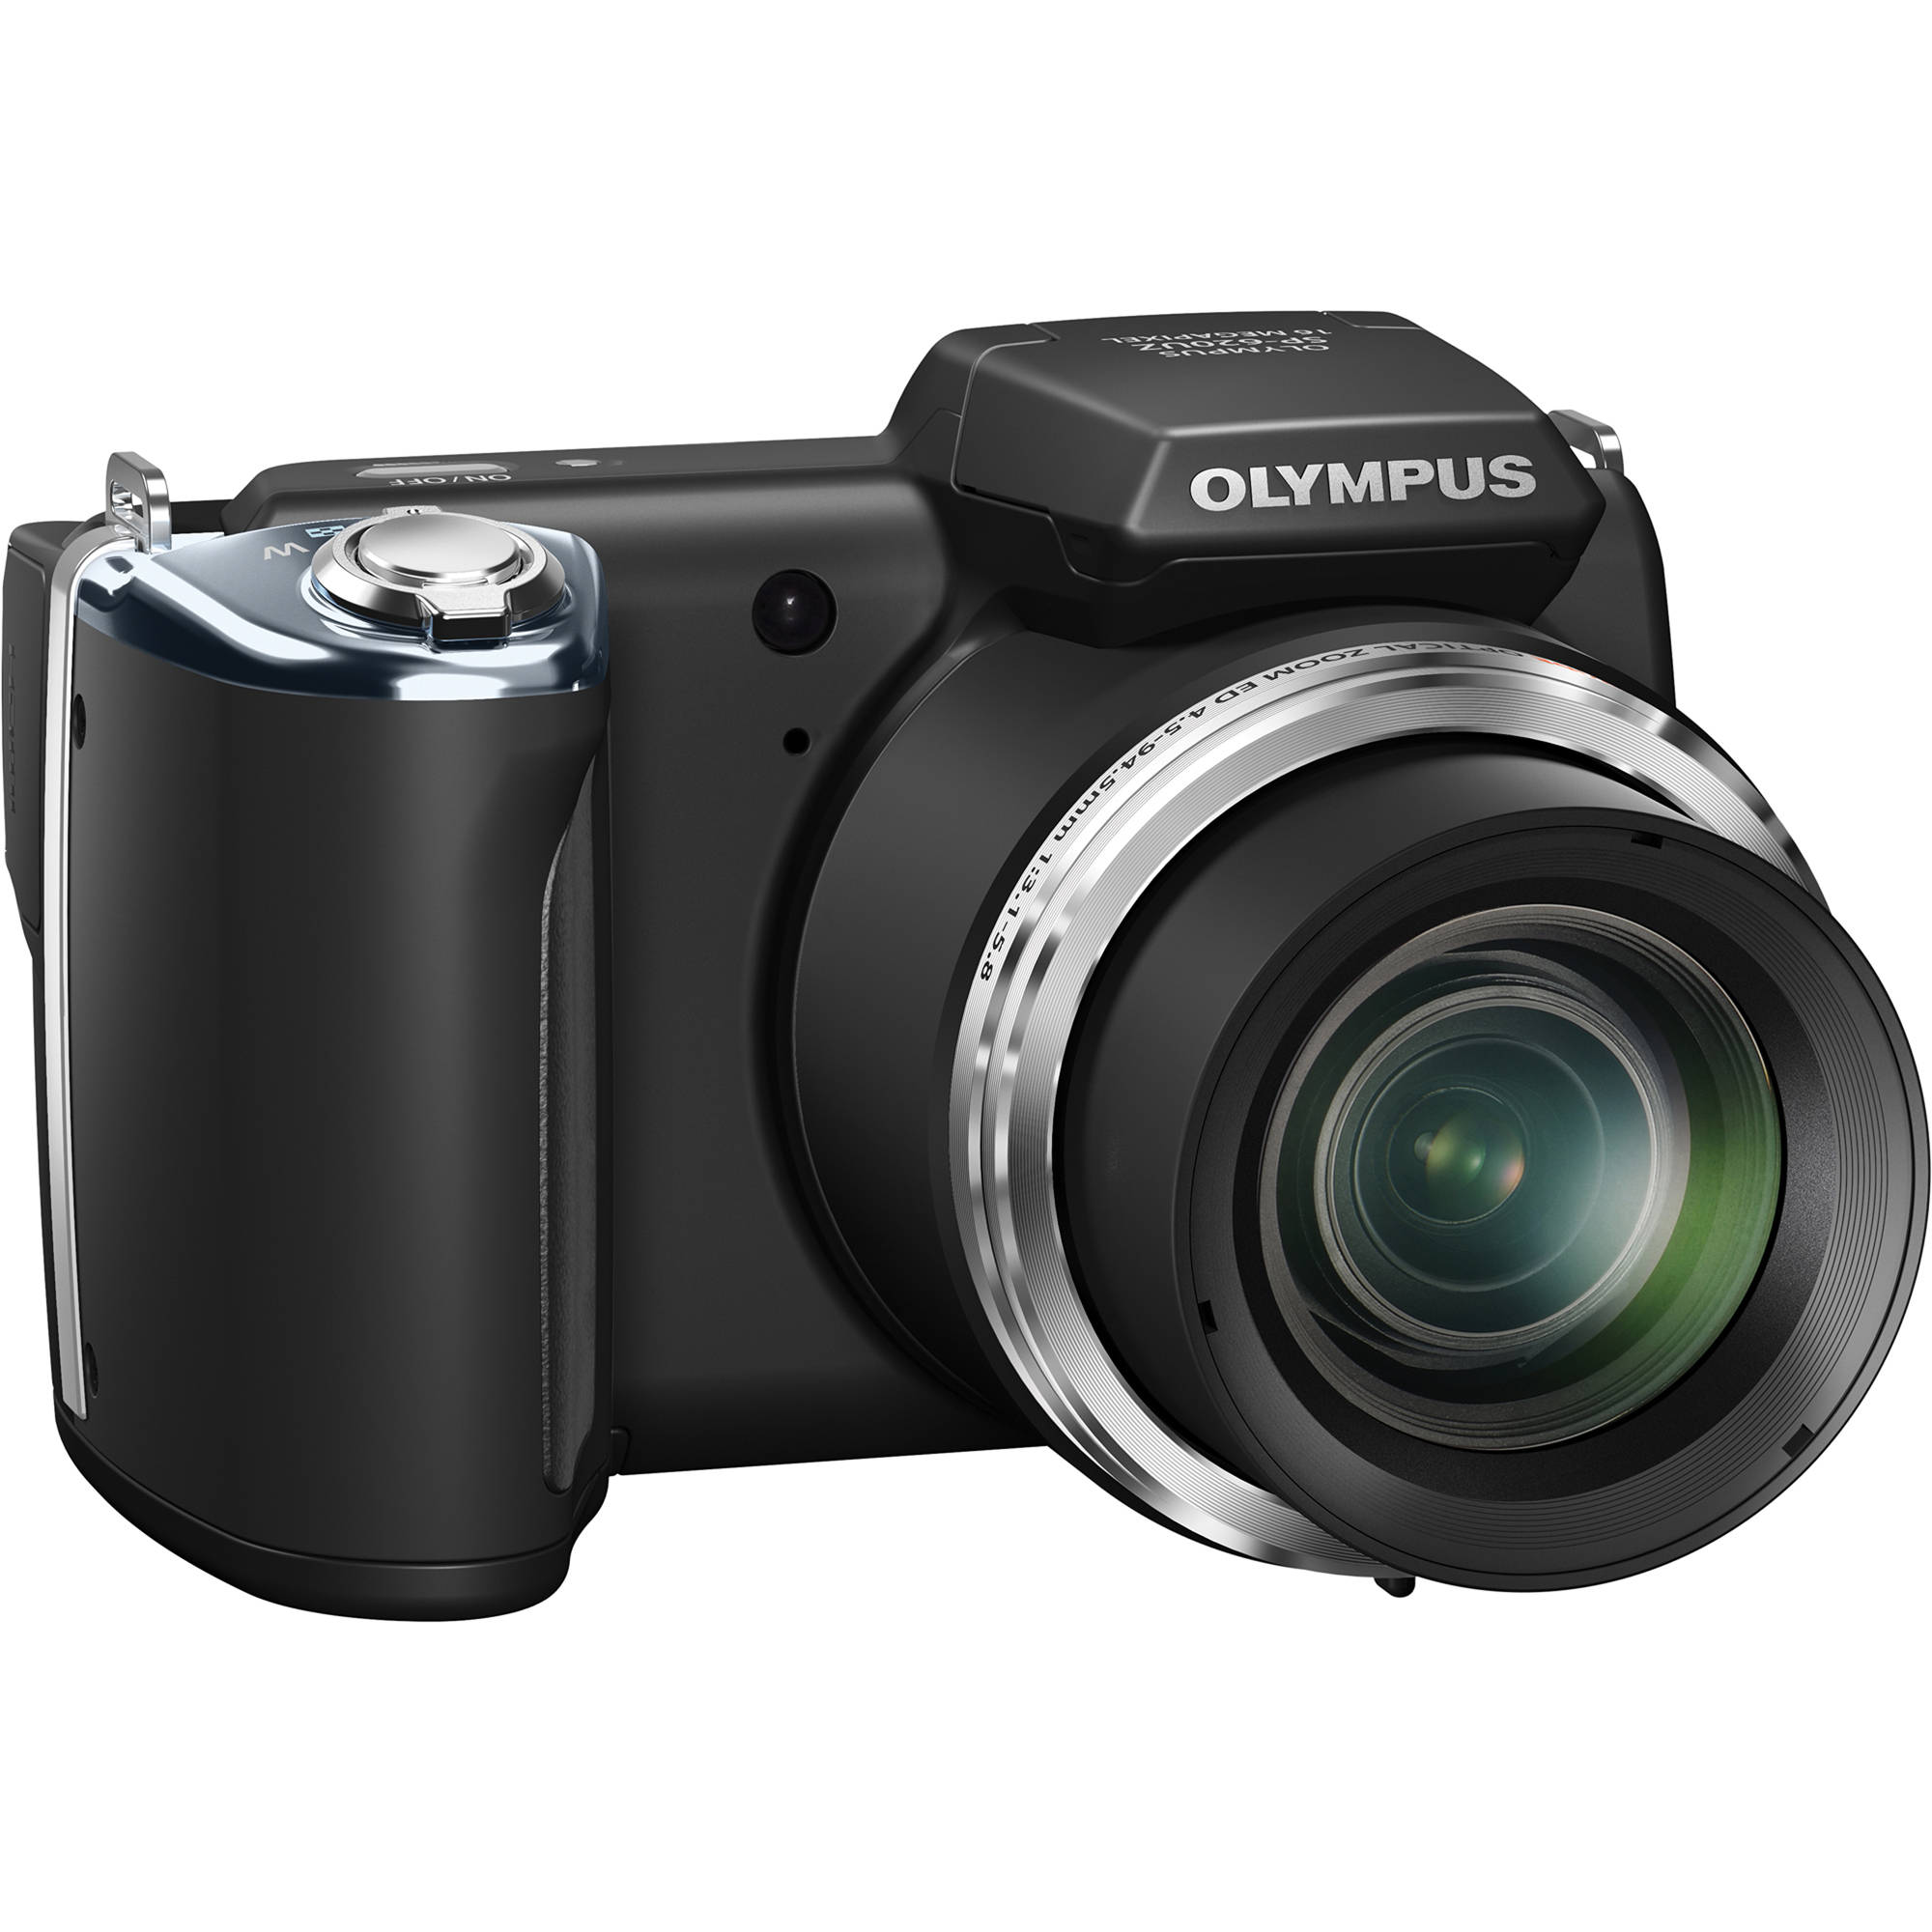 Memory Cards SDHC 2 Pack Olympus SP-620UZ Digital Camera Memory Card 2 x 8GB Secure Digital High Capacity